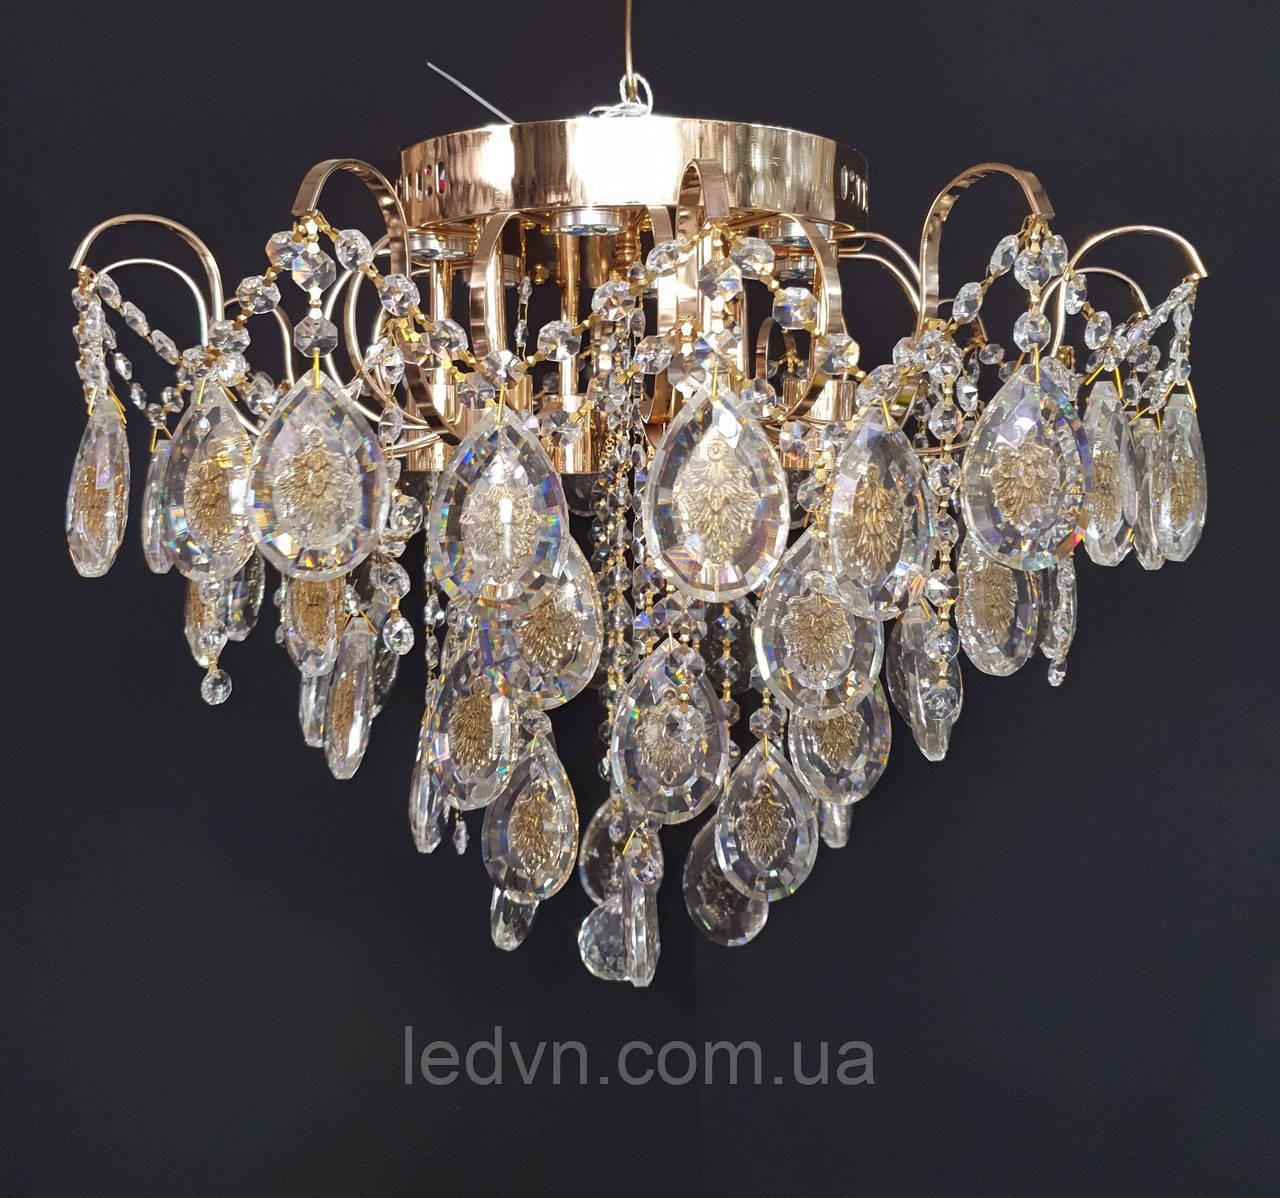 Хрустальная люстра классичесская с LED подсветкой на 6 лампочек золото